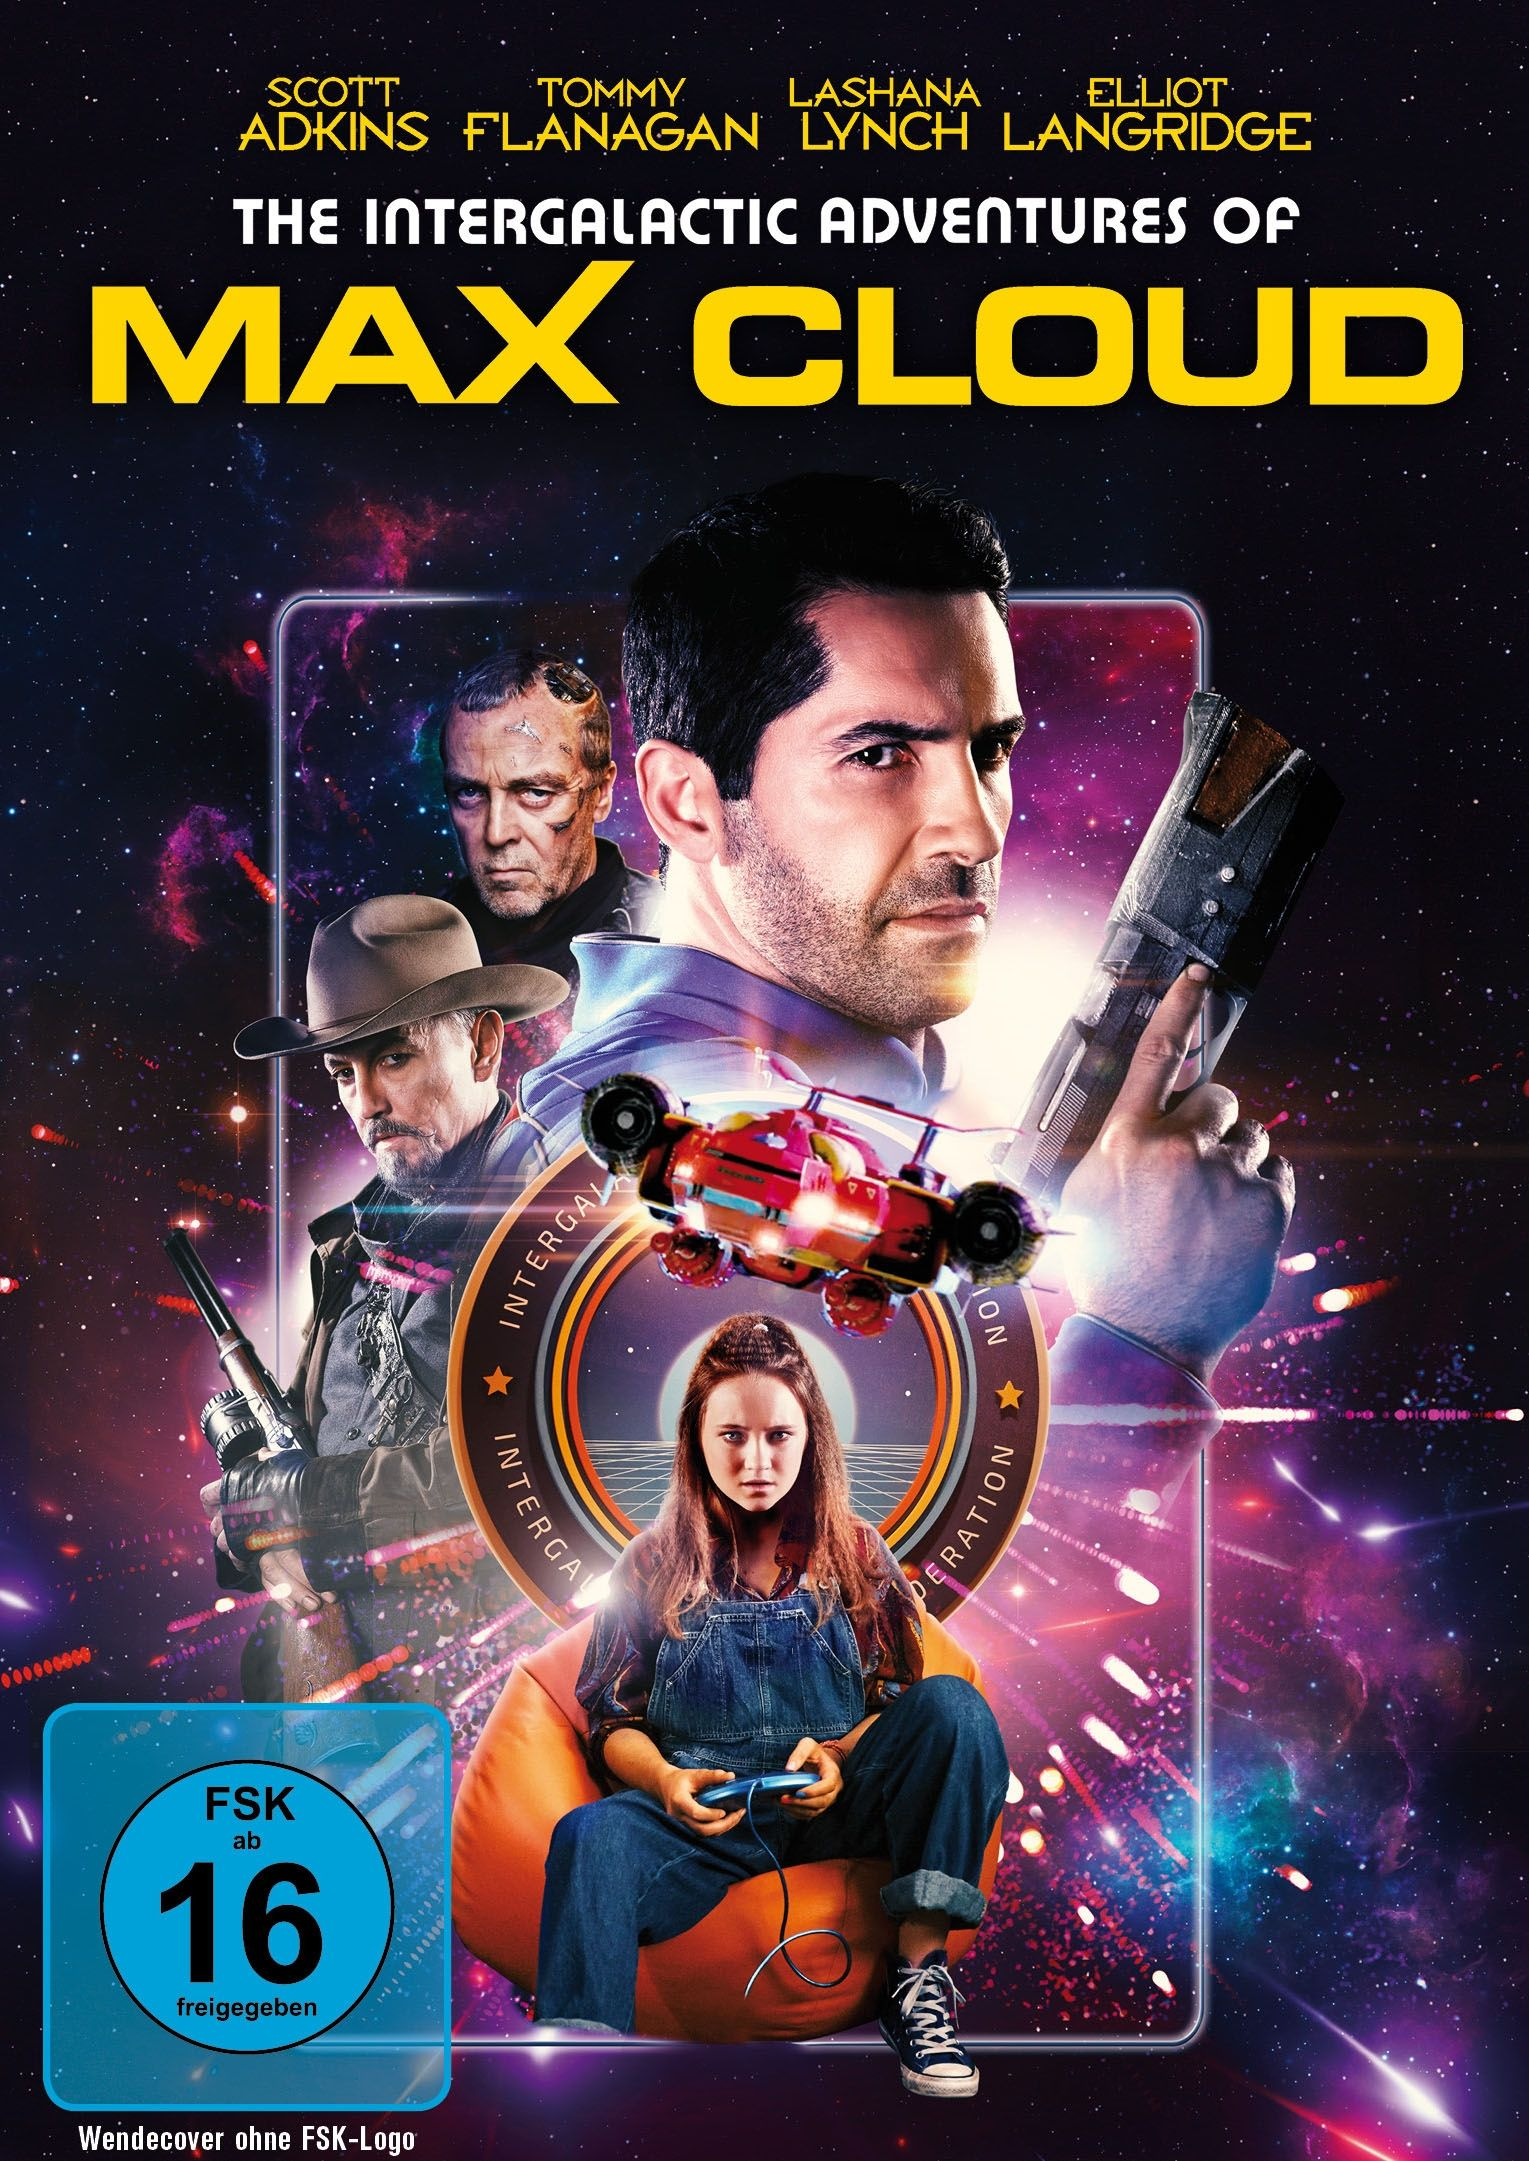 Intergalactic Adventures of Max Cloud, The